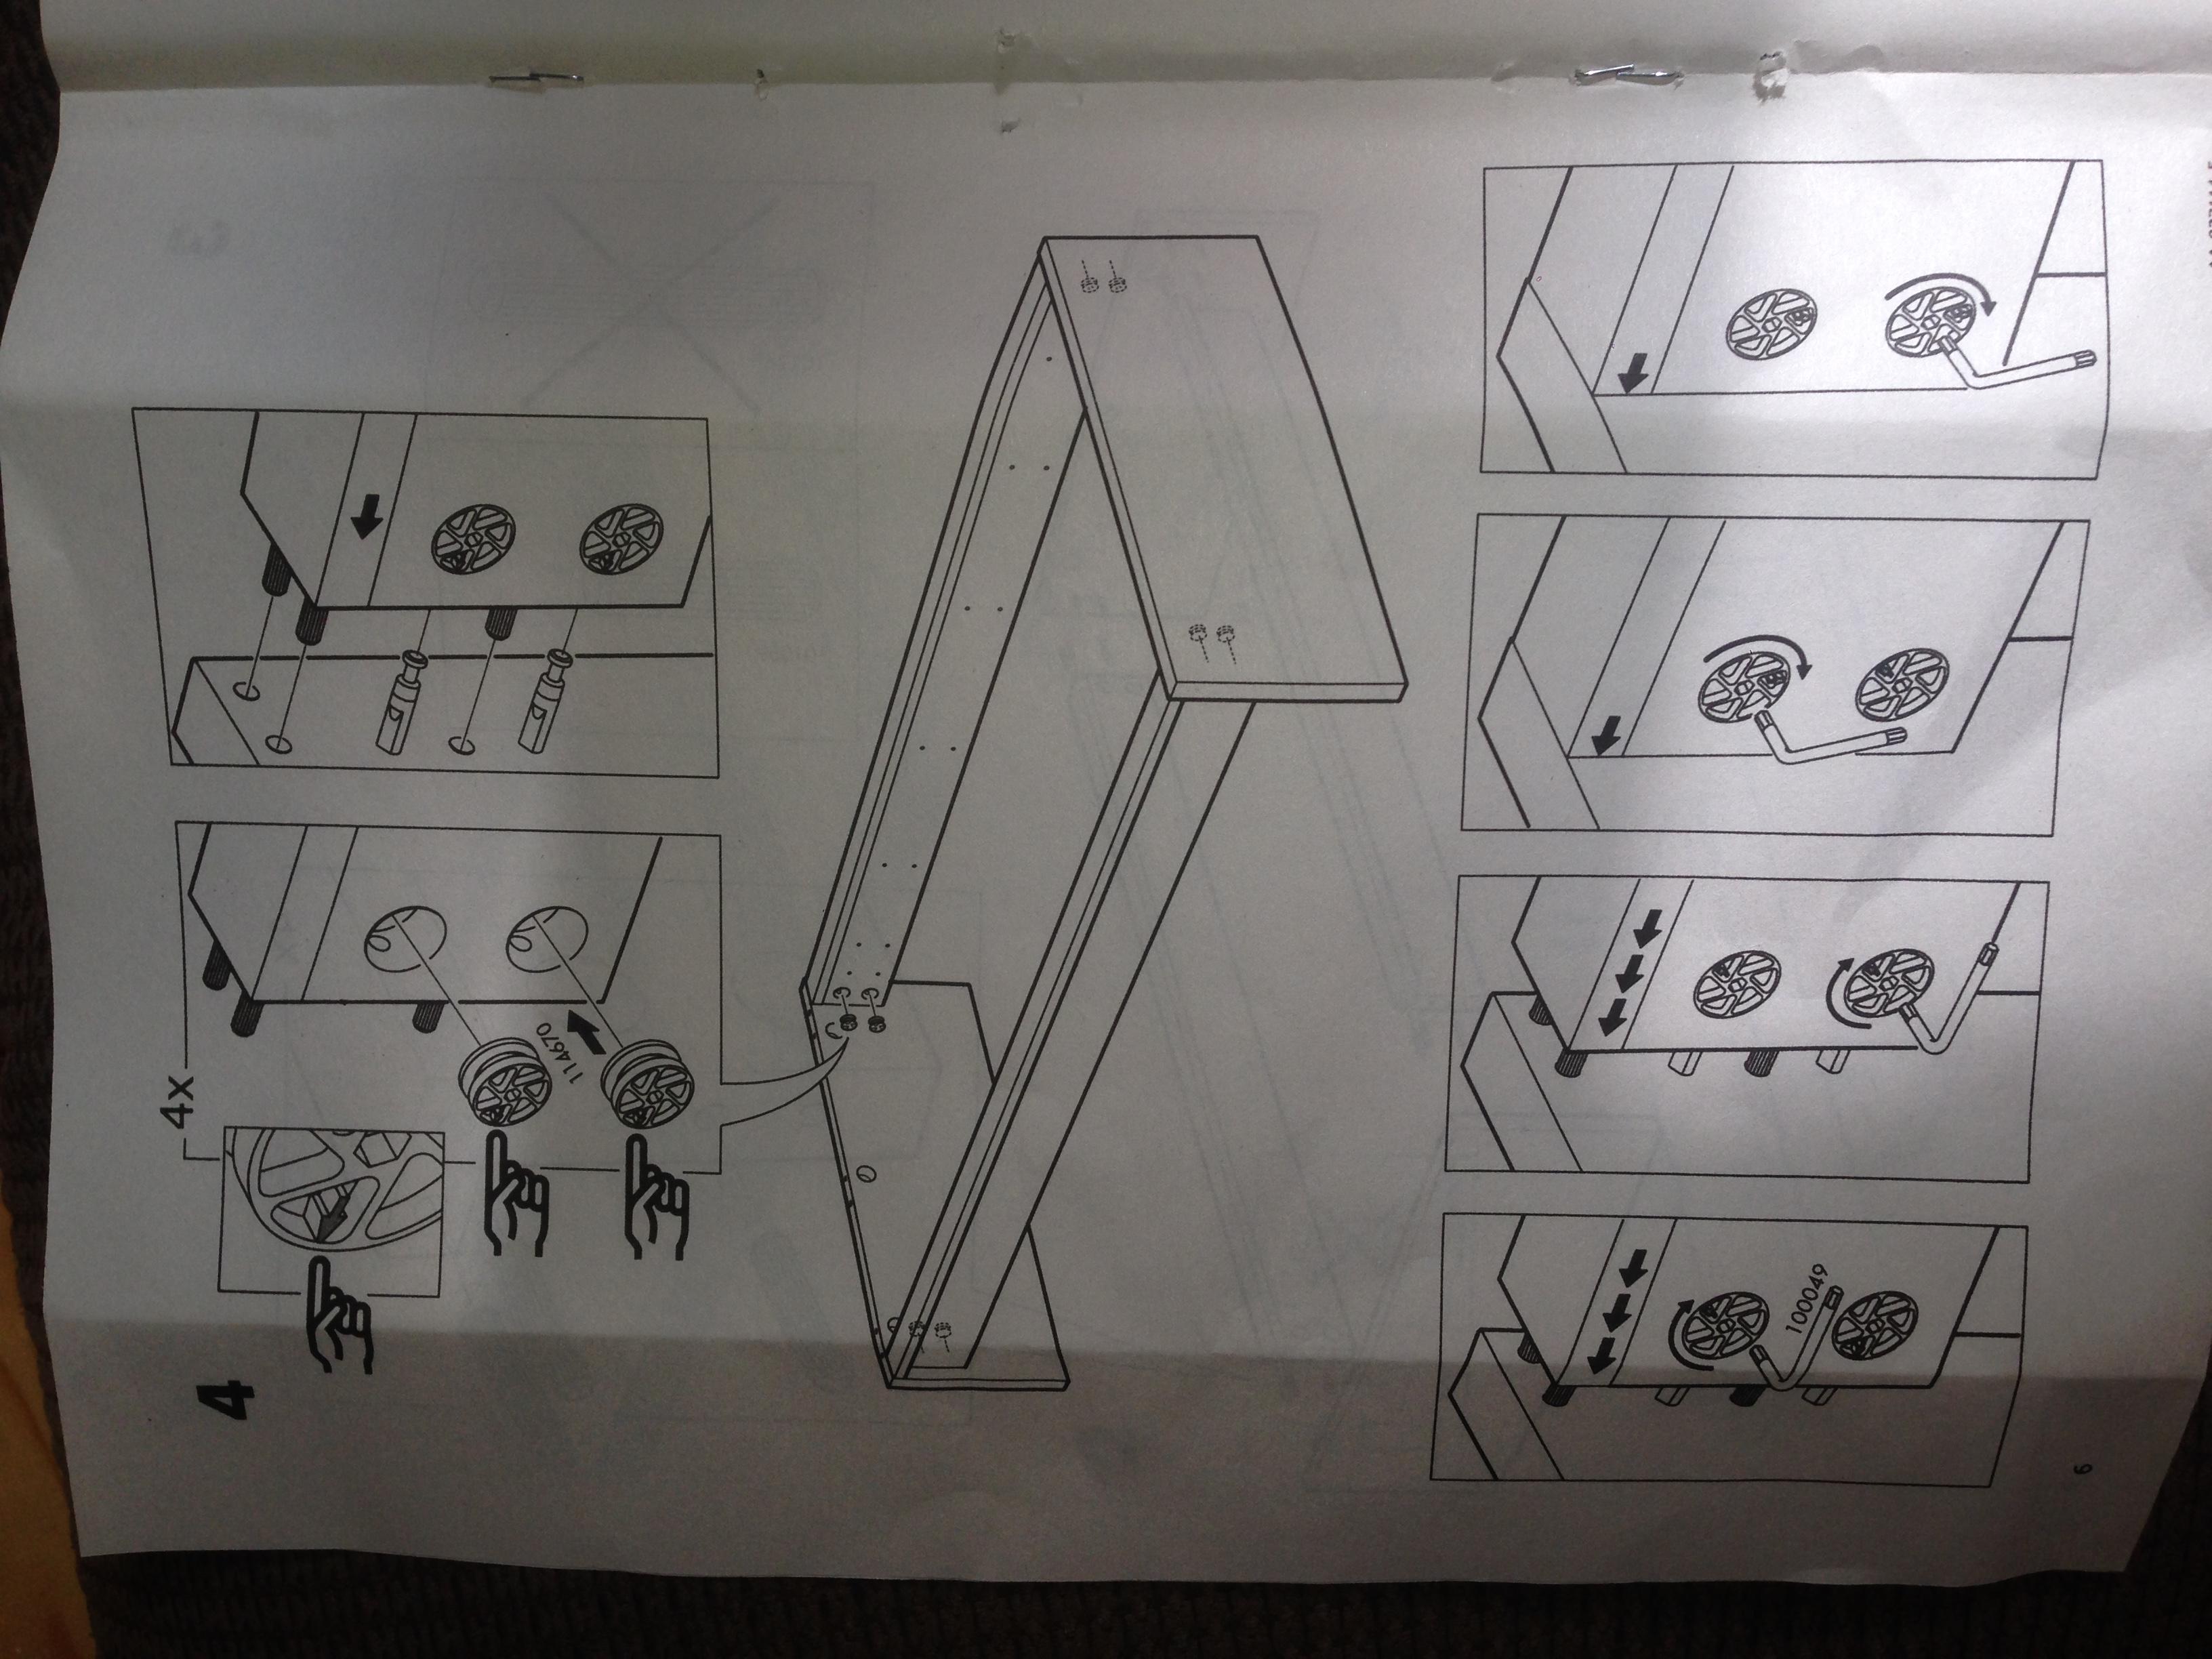 Montageanleitung ikea kühlschrank front: ikea dunstabzugshaube udden